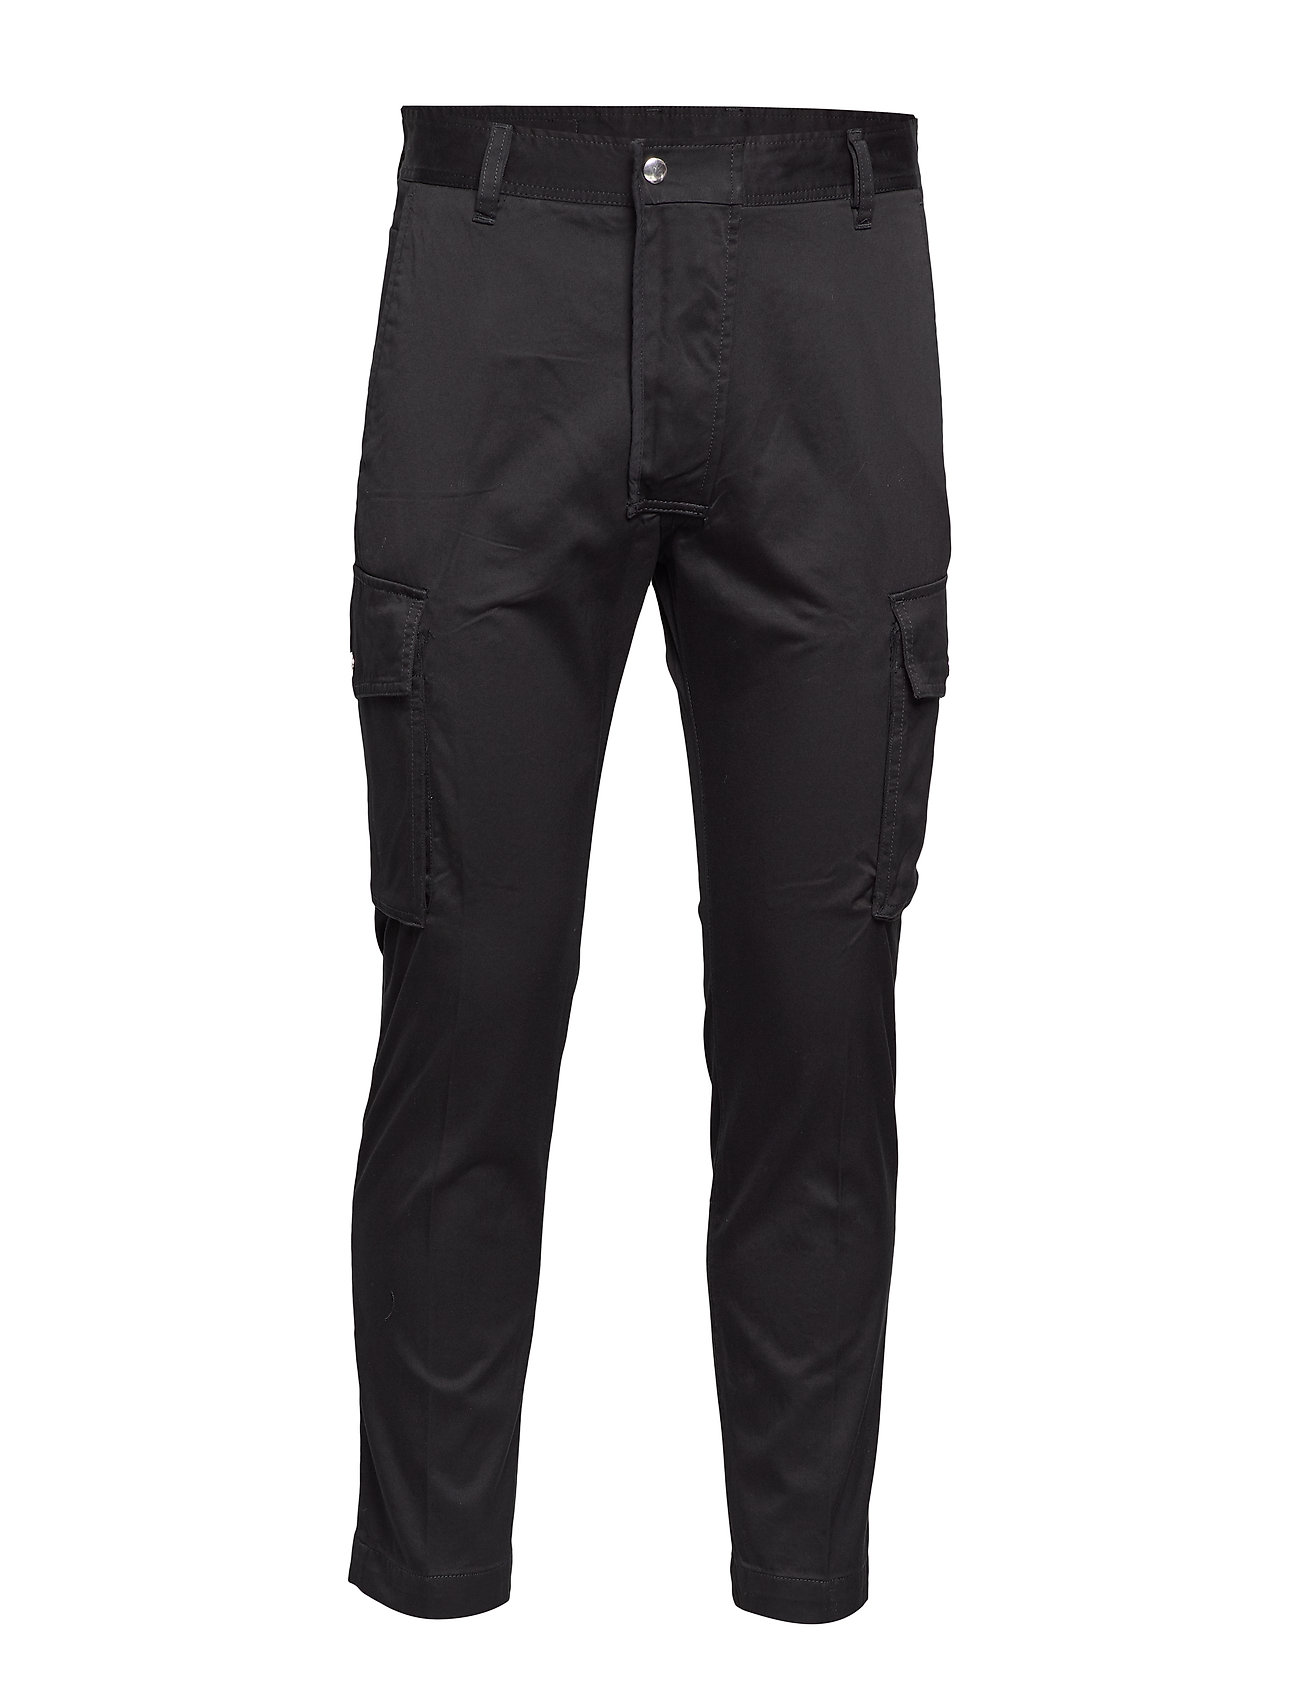 Image of P-Jared-Cargo Trousers Trousers Cargo Pants Sort Diesel Men (3228056731)